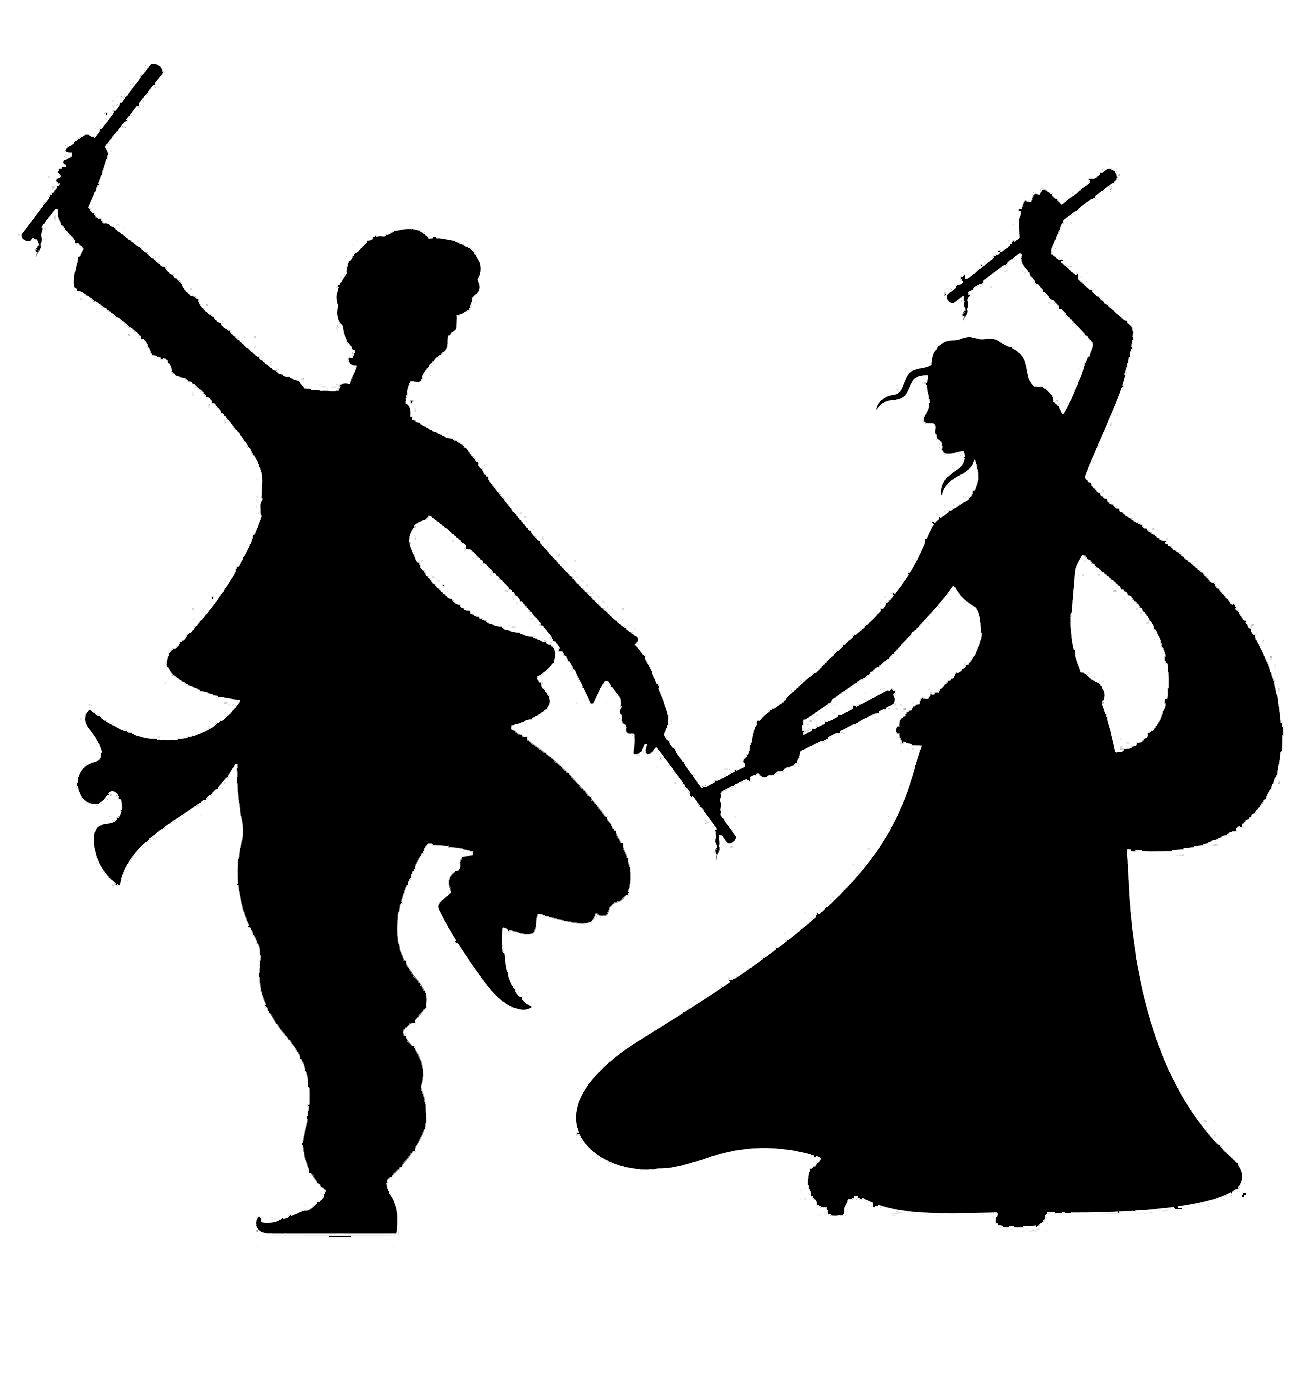 Clipart Folkdance Indian Group Dance Clipart Clipartfest Dance Silhouette Dancers Art Folk Dance